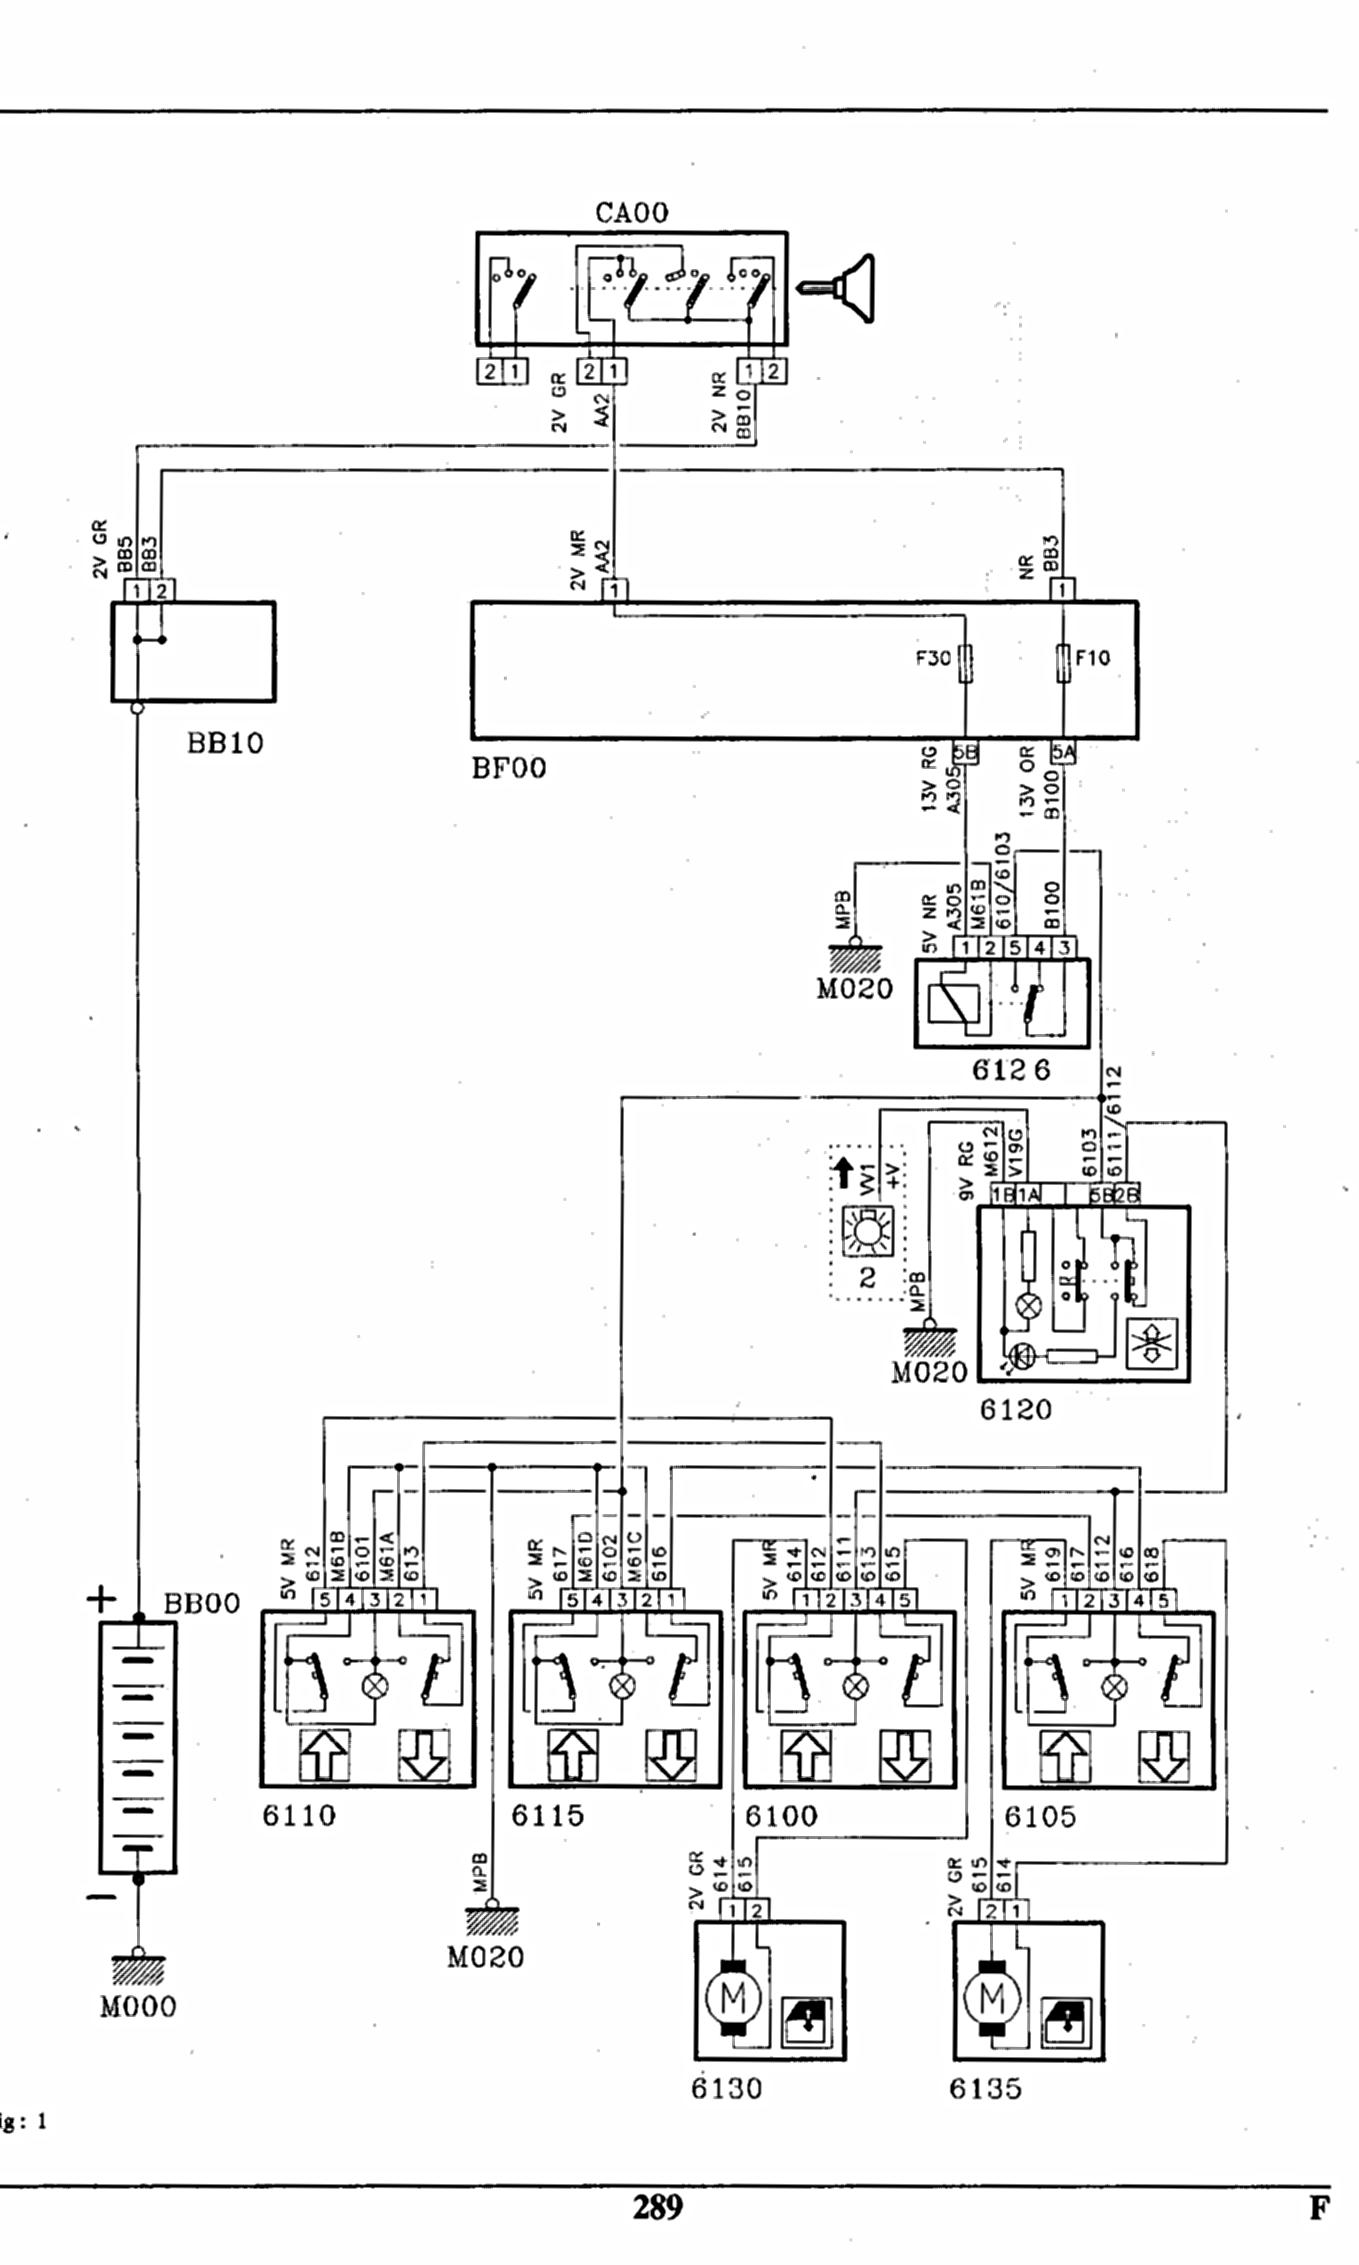 schema faisceau electrique 405 mi16